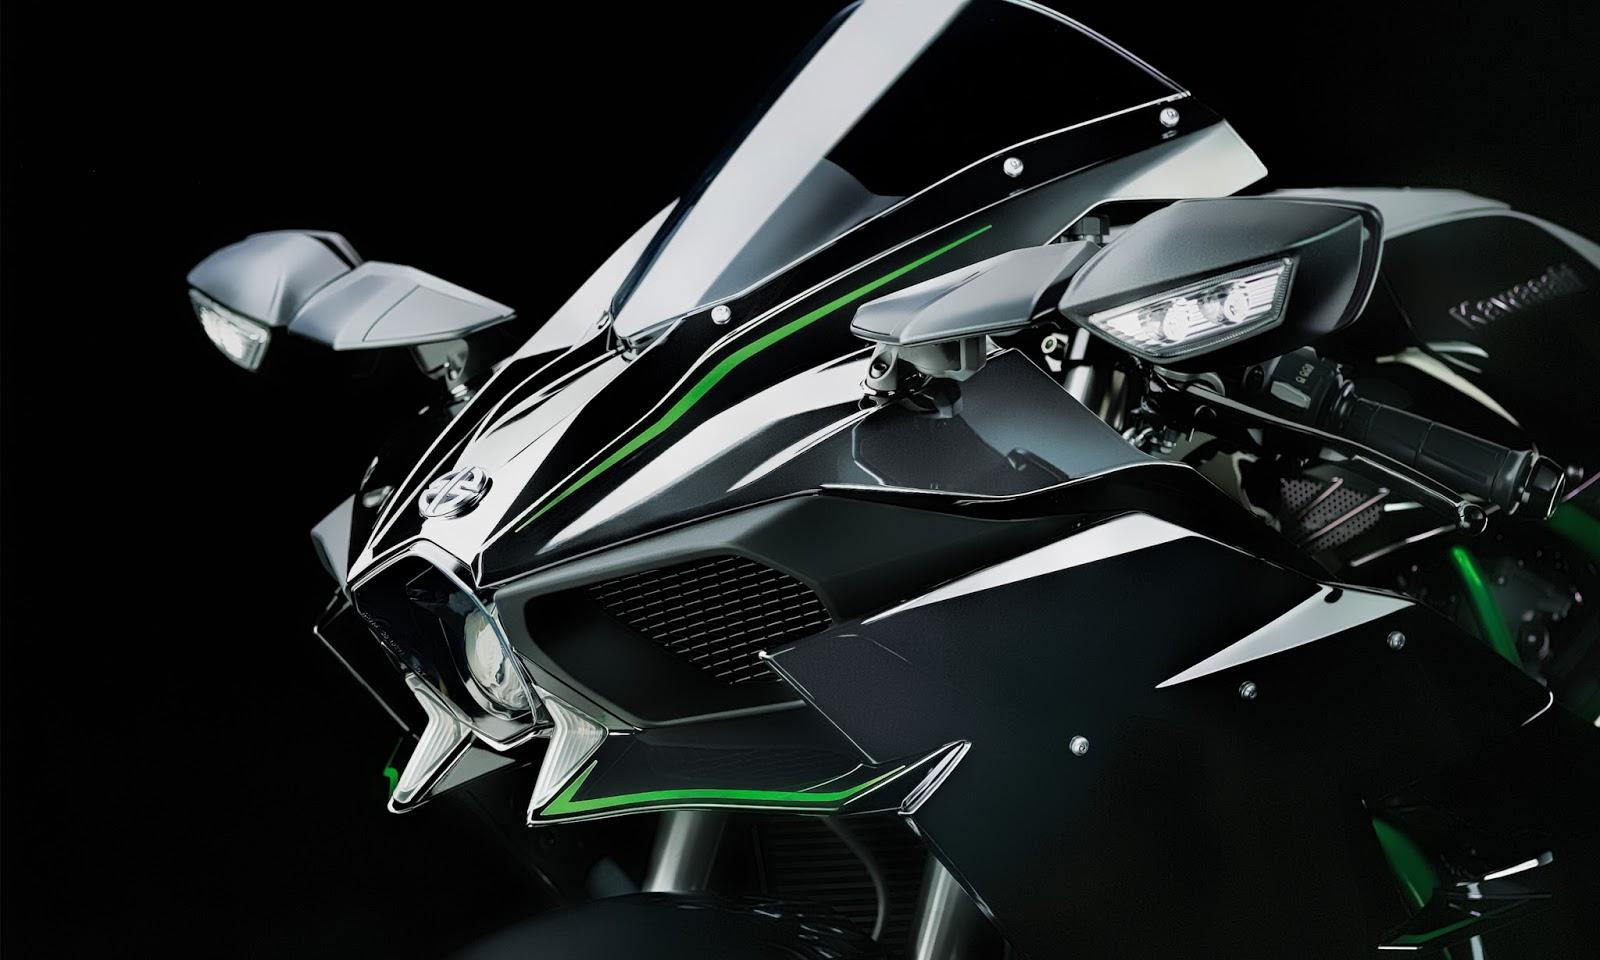 Kawasaki Ninja H2R HD Wallpapers